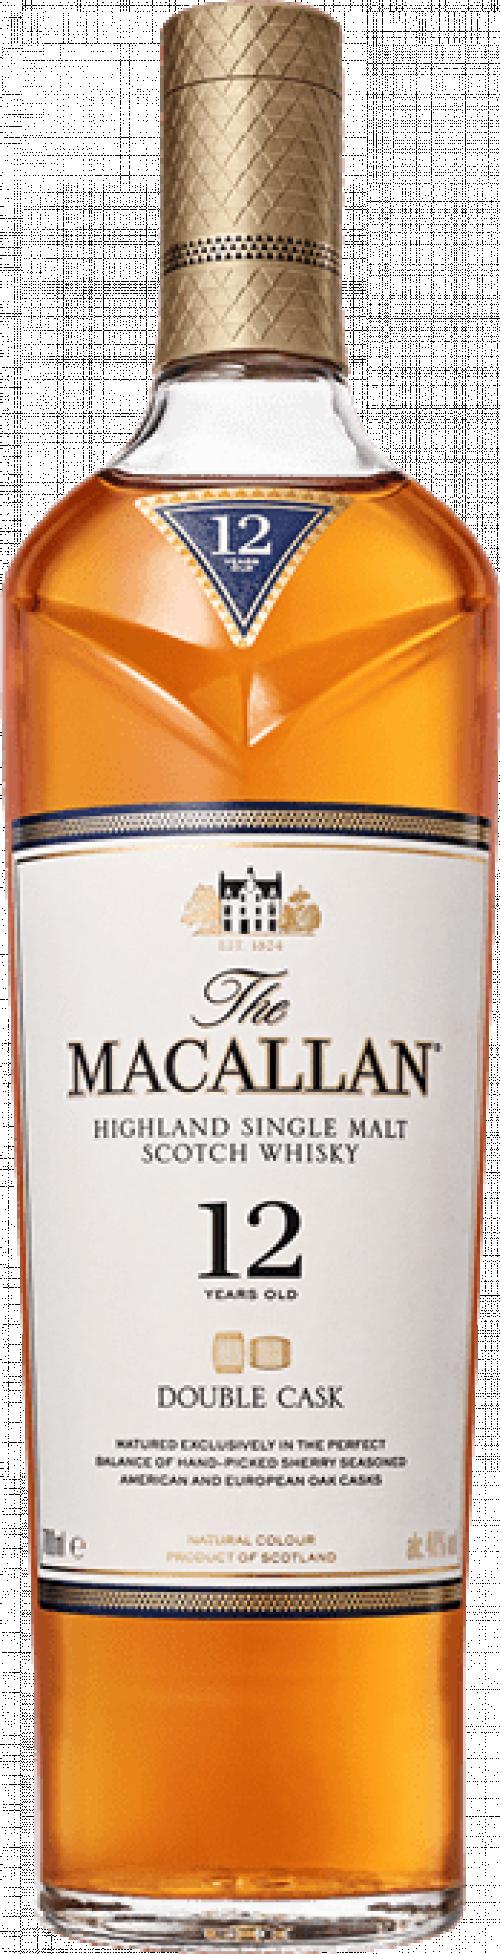 Macallan Double Cask 12Yr Scotch Whisky 750ml